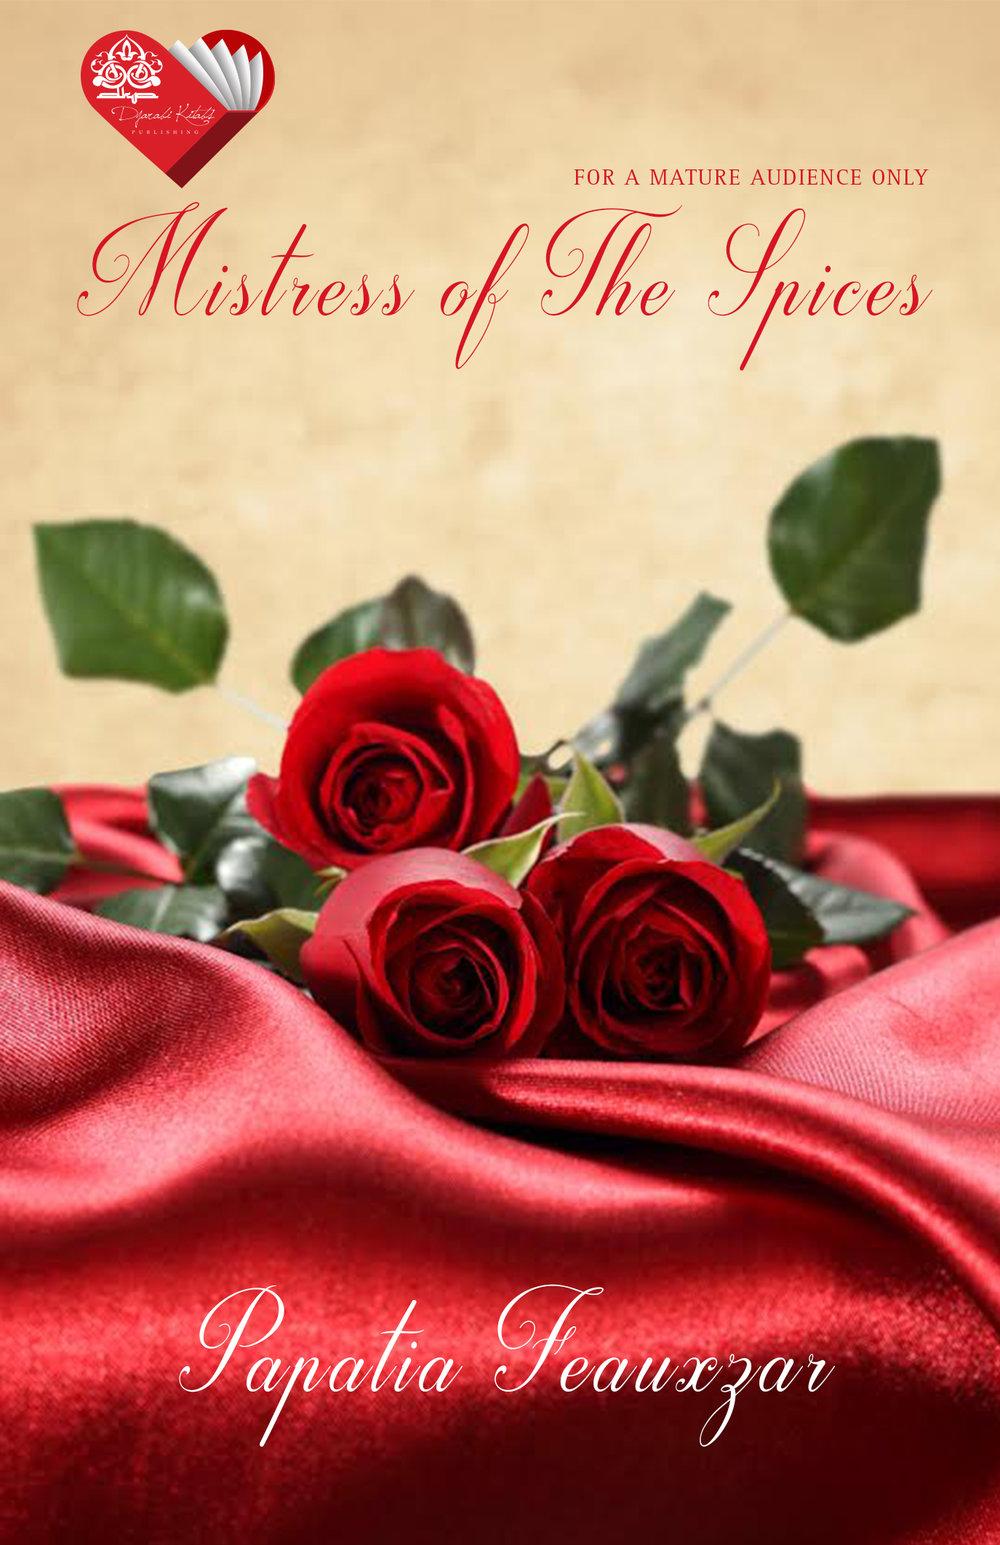 Mistress of The Spices svp 1.jpg